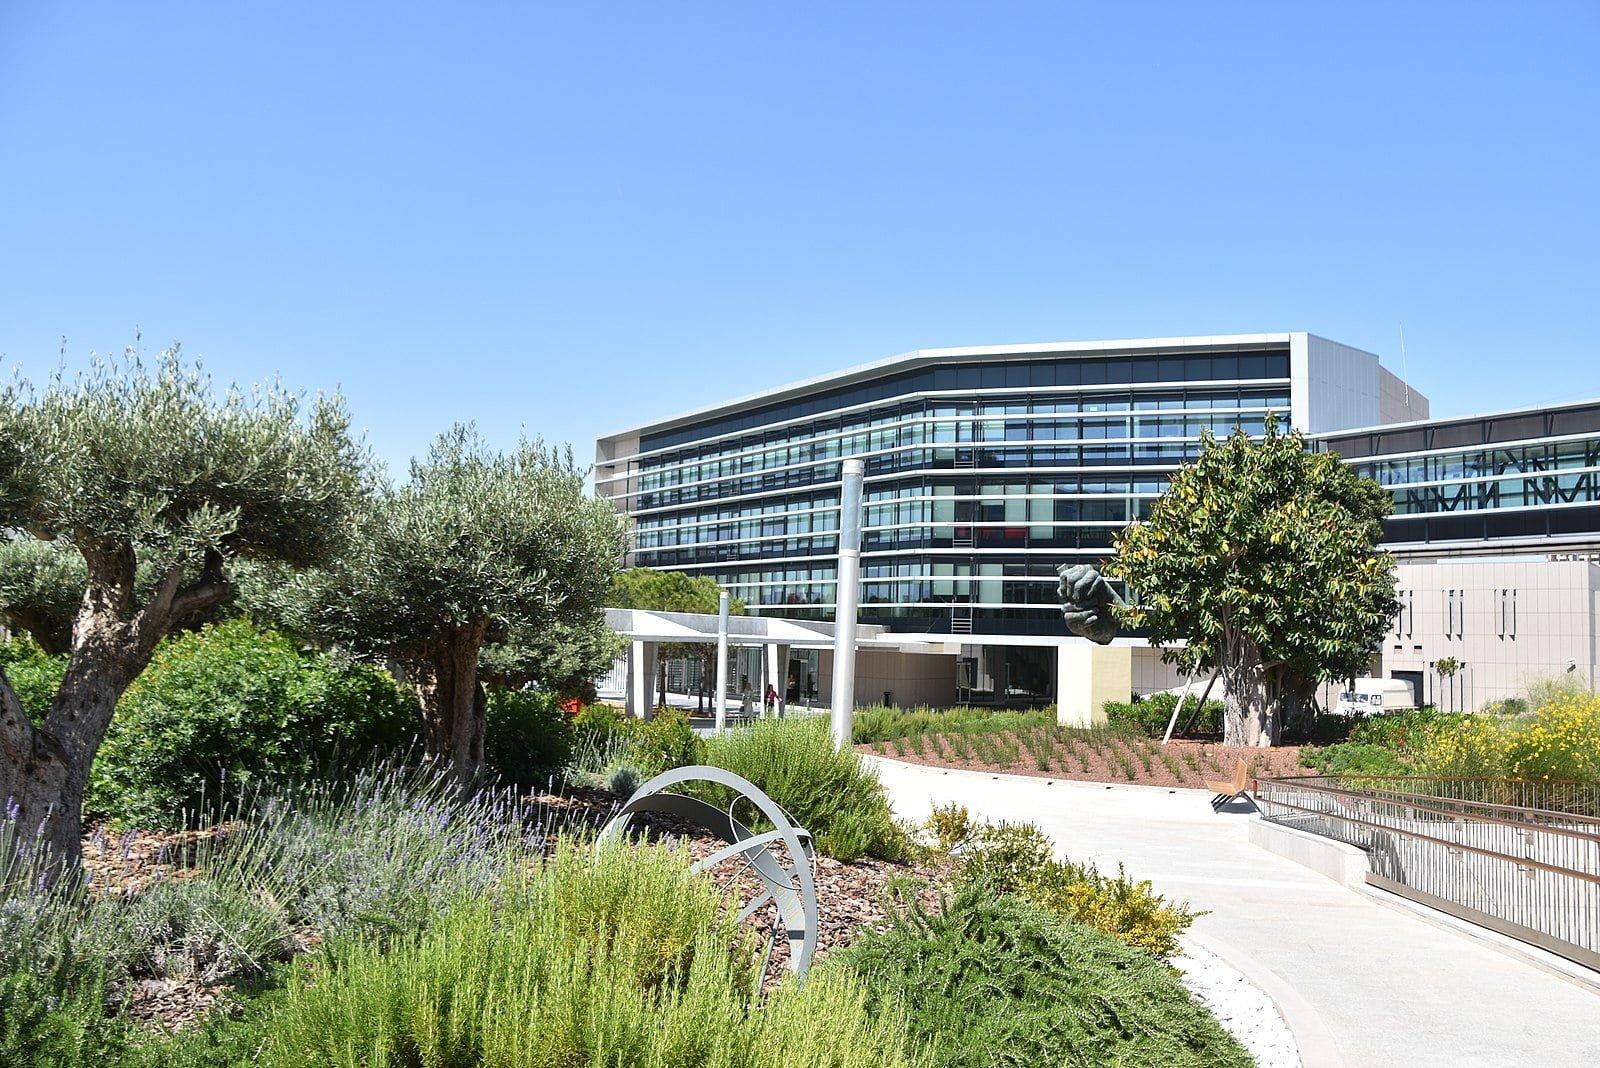 Siedziba Urzędu Patentowego UE (EUIPO)